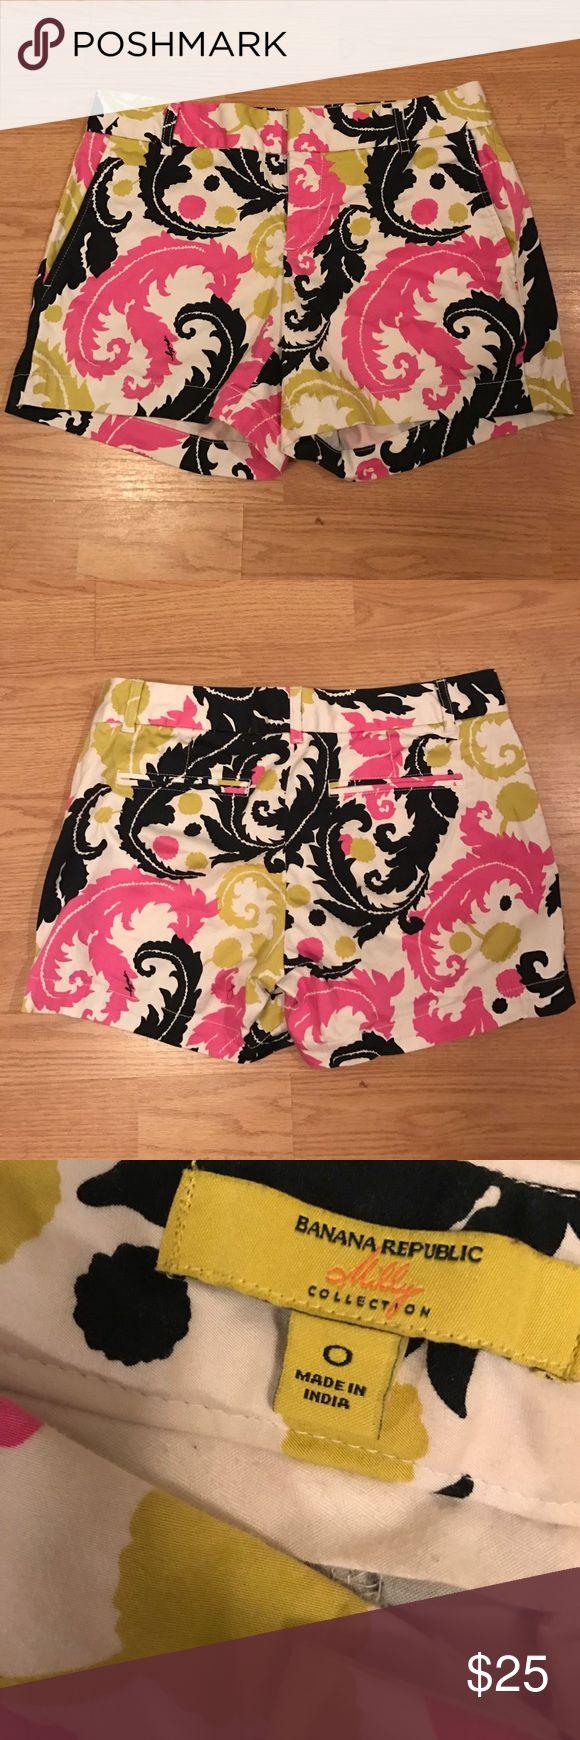 Milly for Banana Republic shorts Designer brand Milly for Banana Republic. Worn 5-6 times. Great condition. Banana Republic Shorts